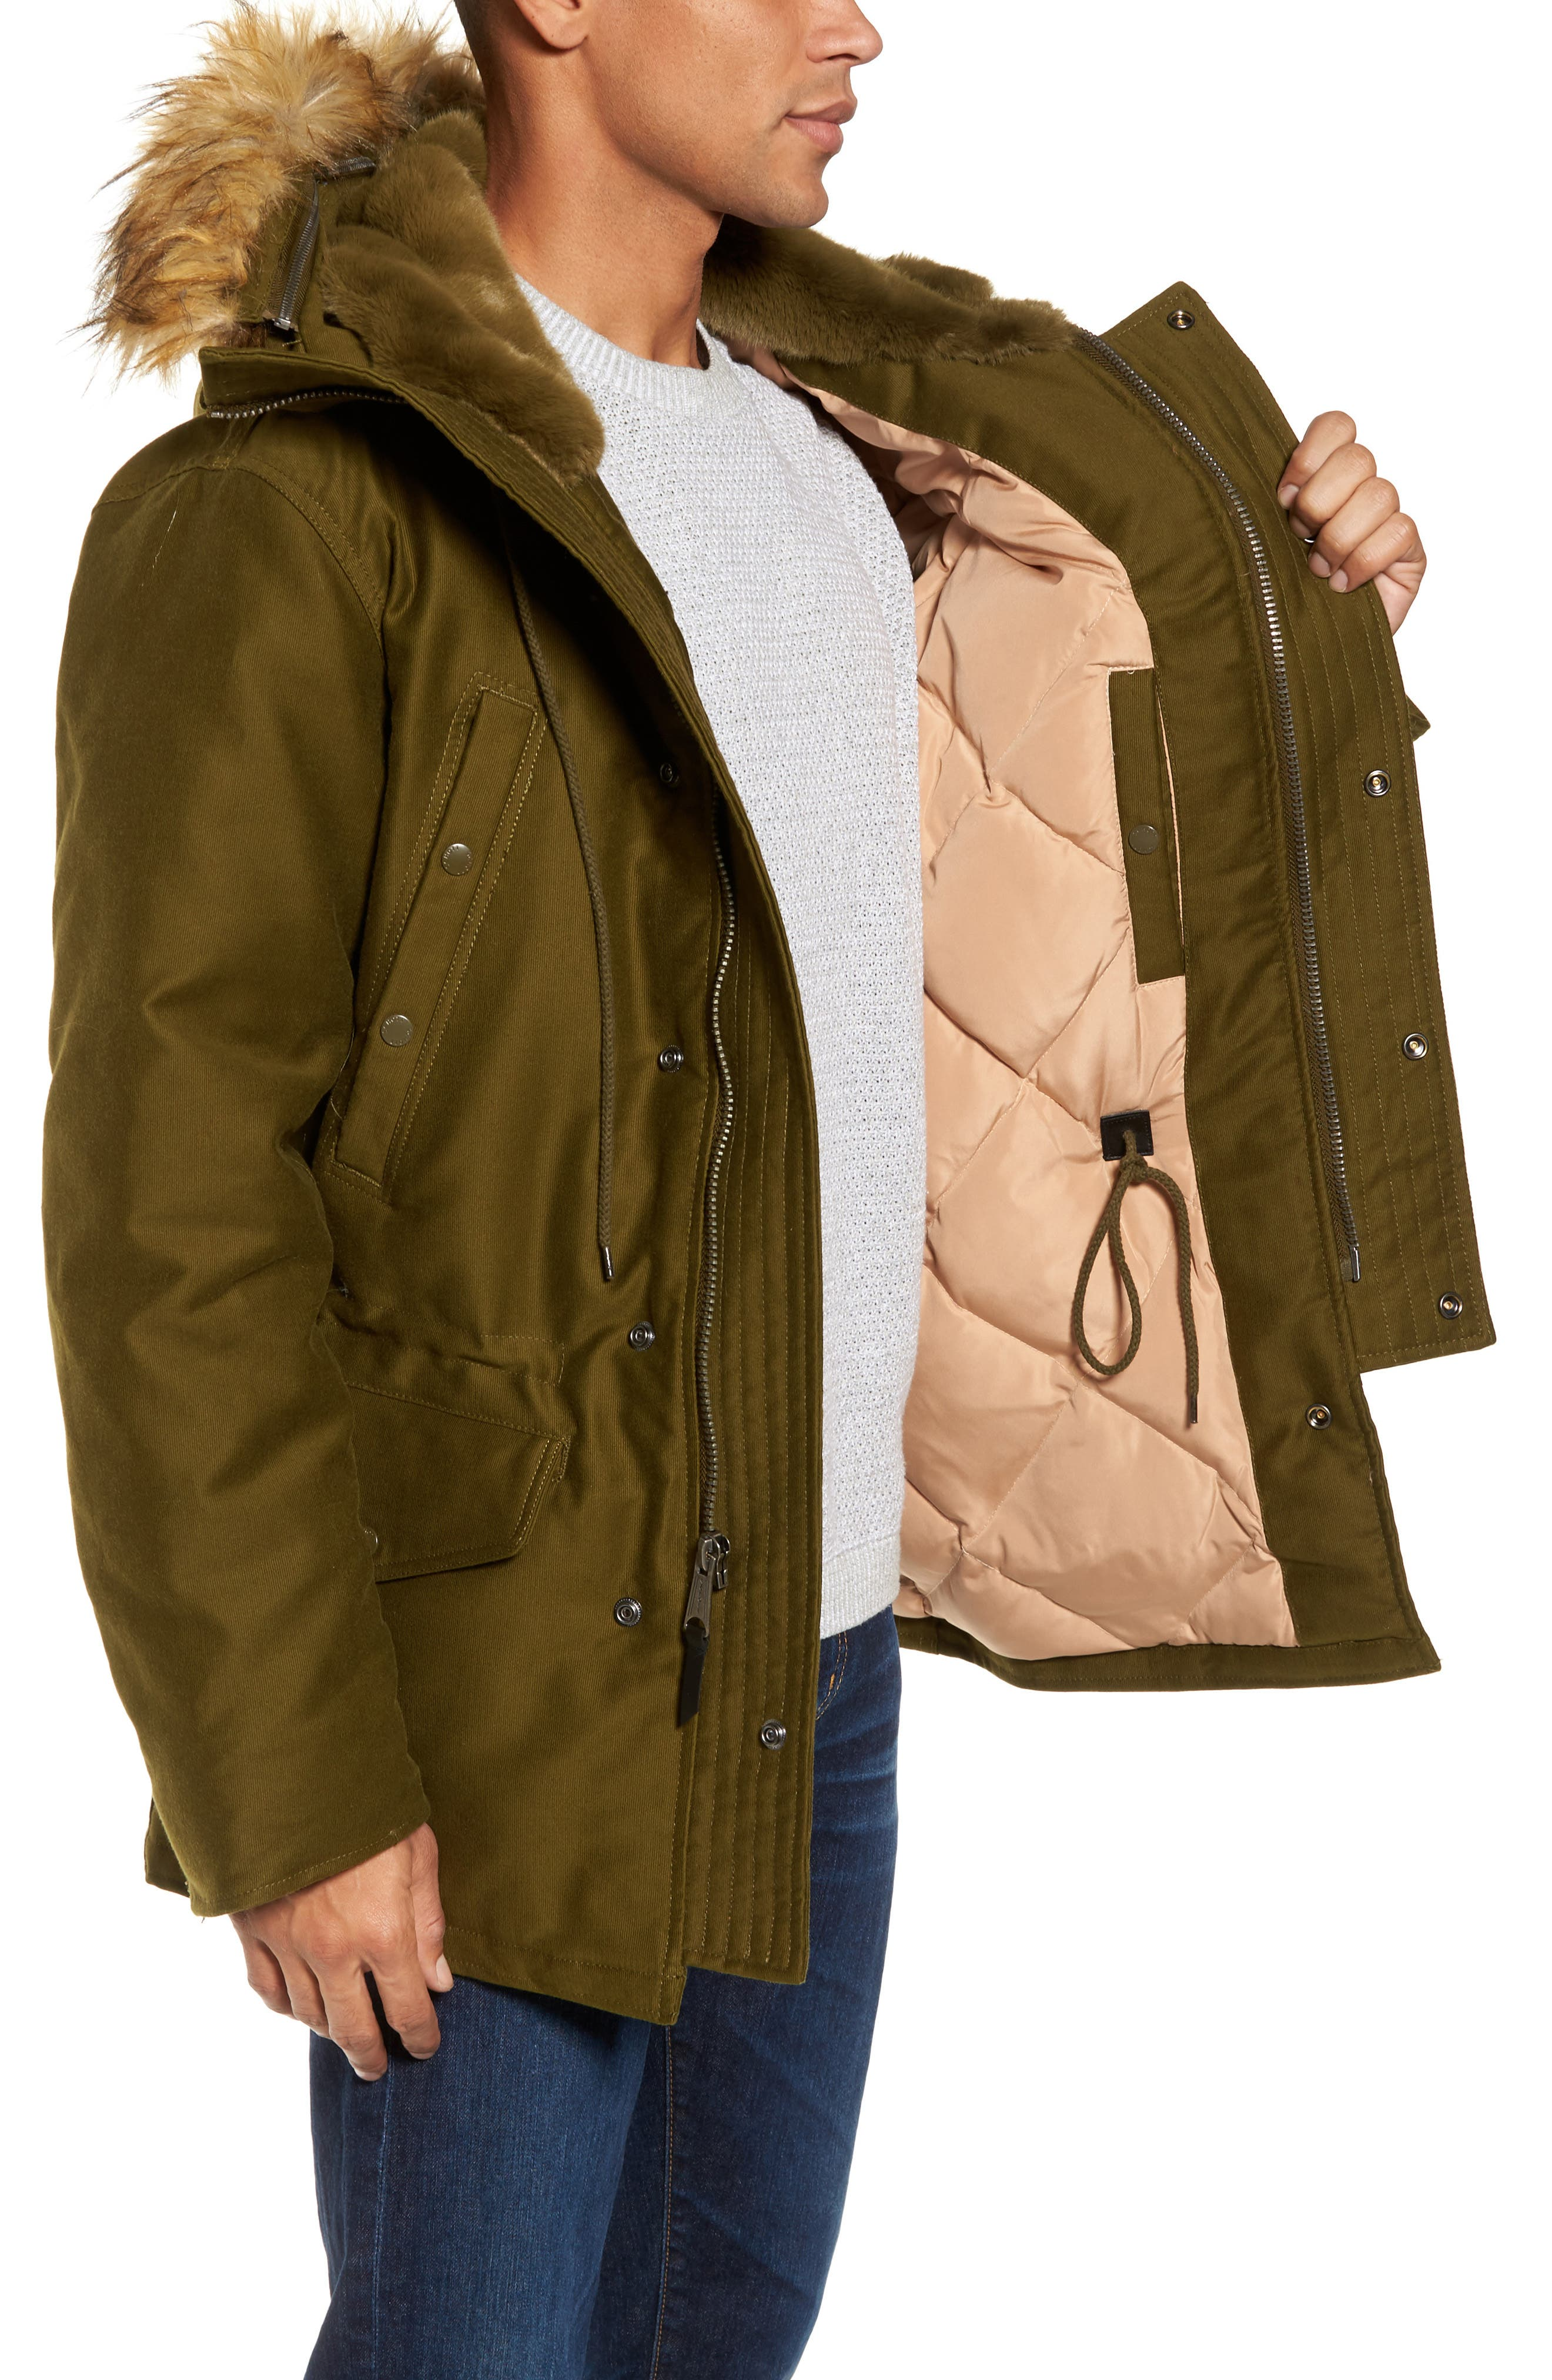 Bedford Corduroy Goose Down Jacket with Faux Fur Trim,                             Alternate thumbnail 3, color,                             352